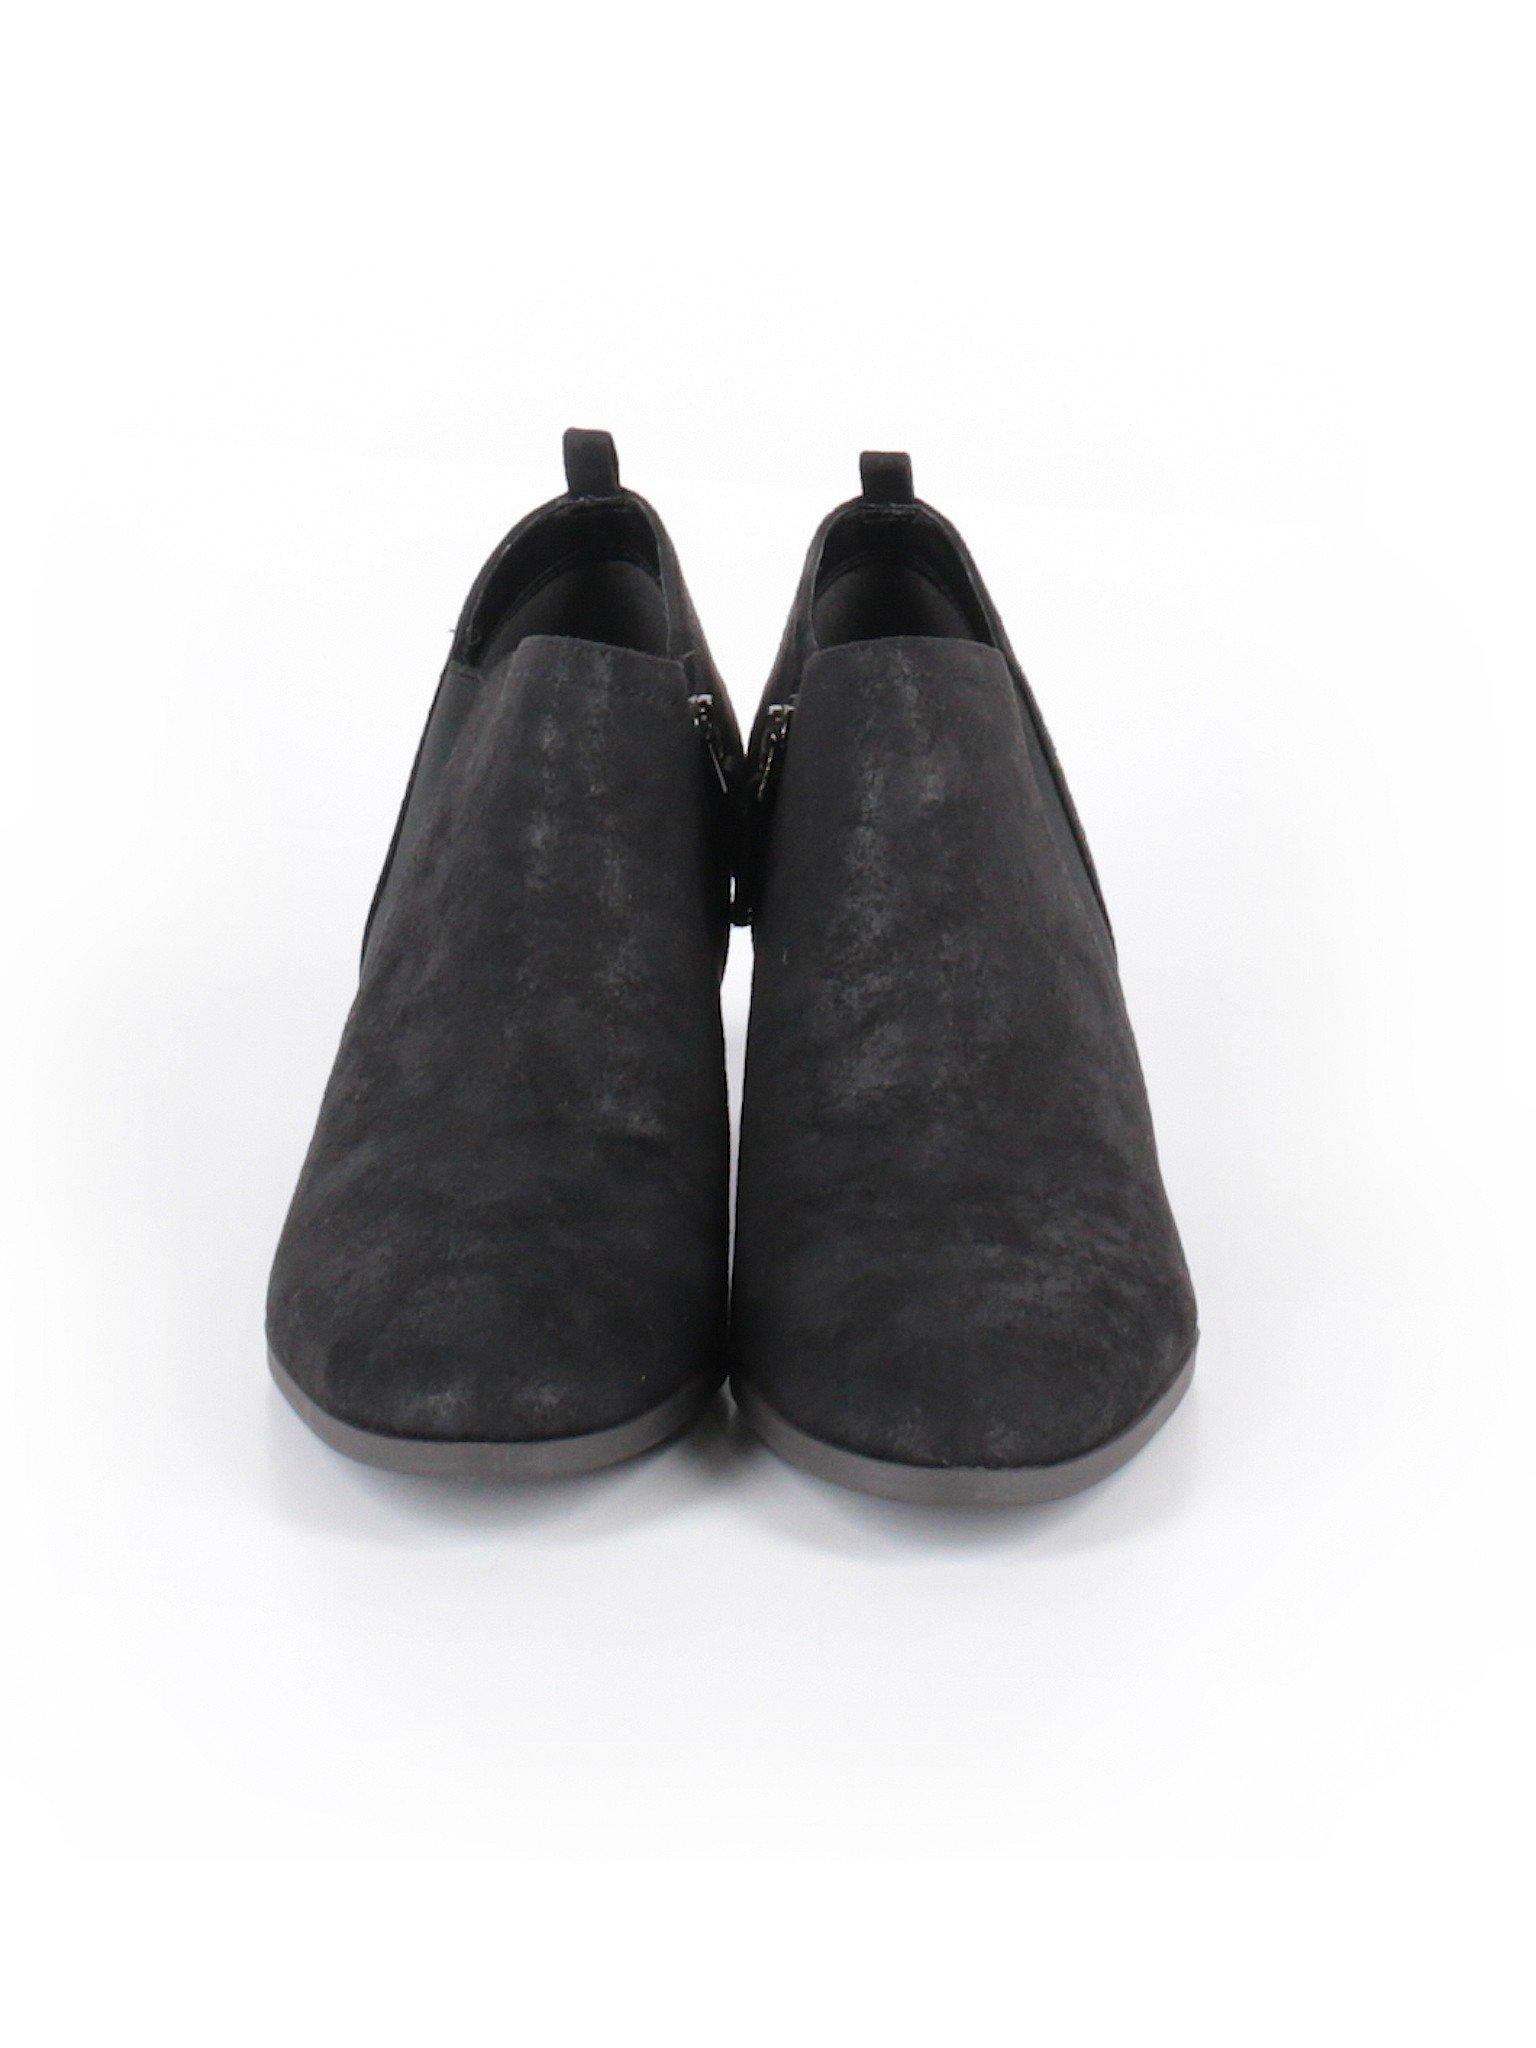 Franco Boutique Boots Sarto promotion Ankle 6qH5xTq